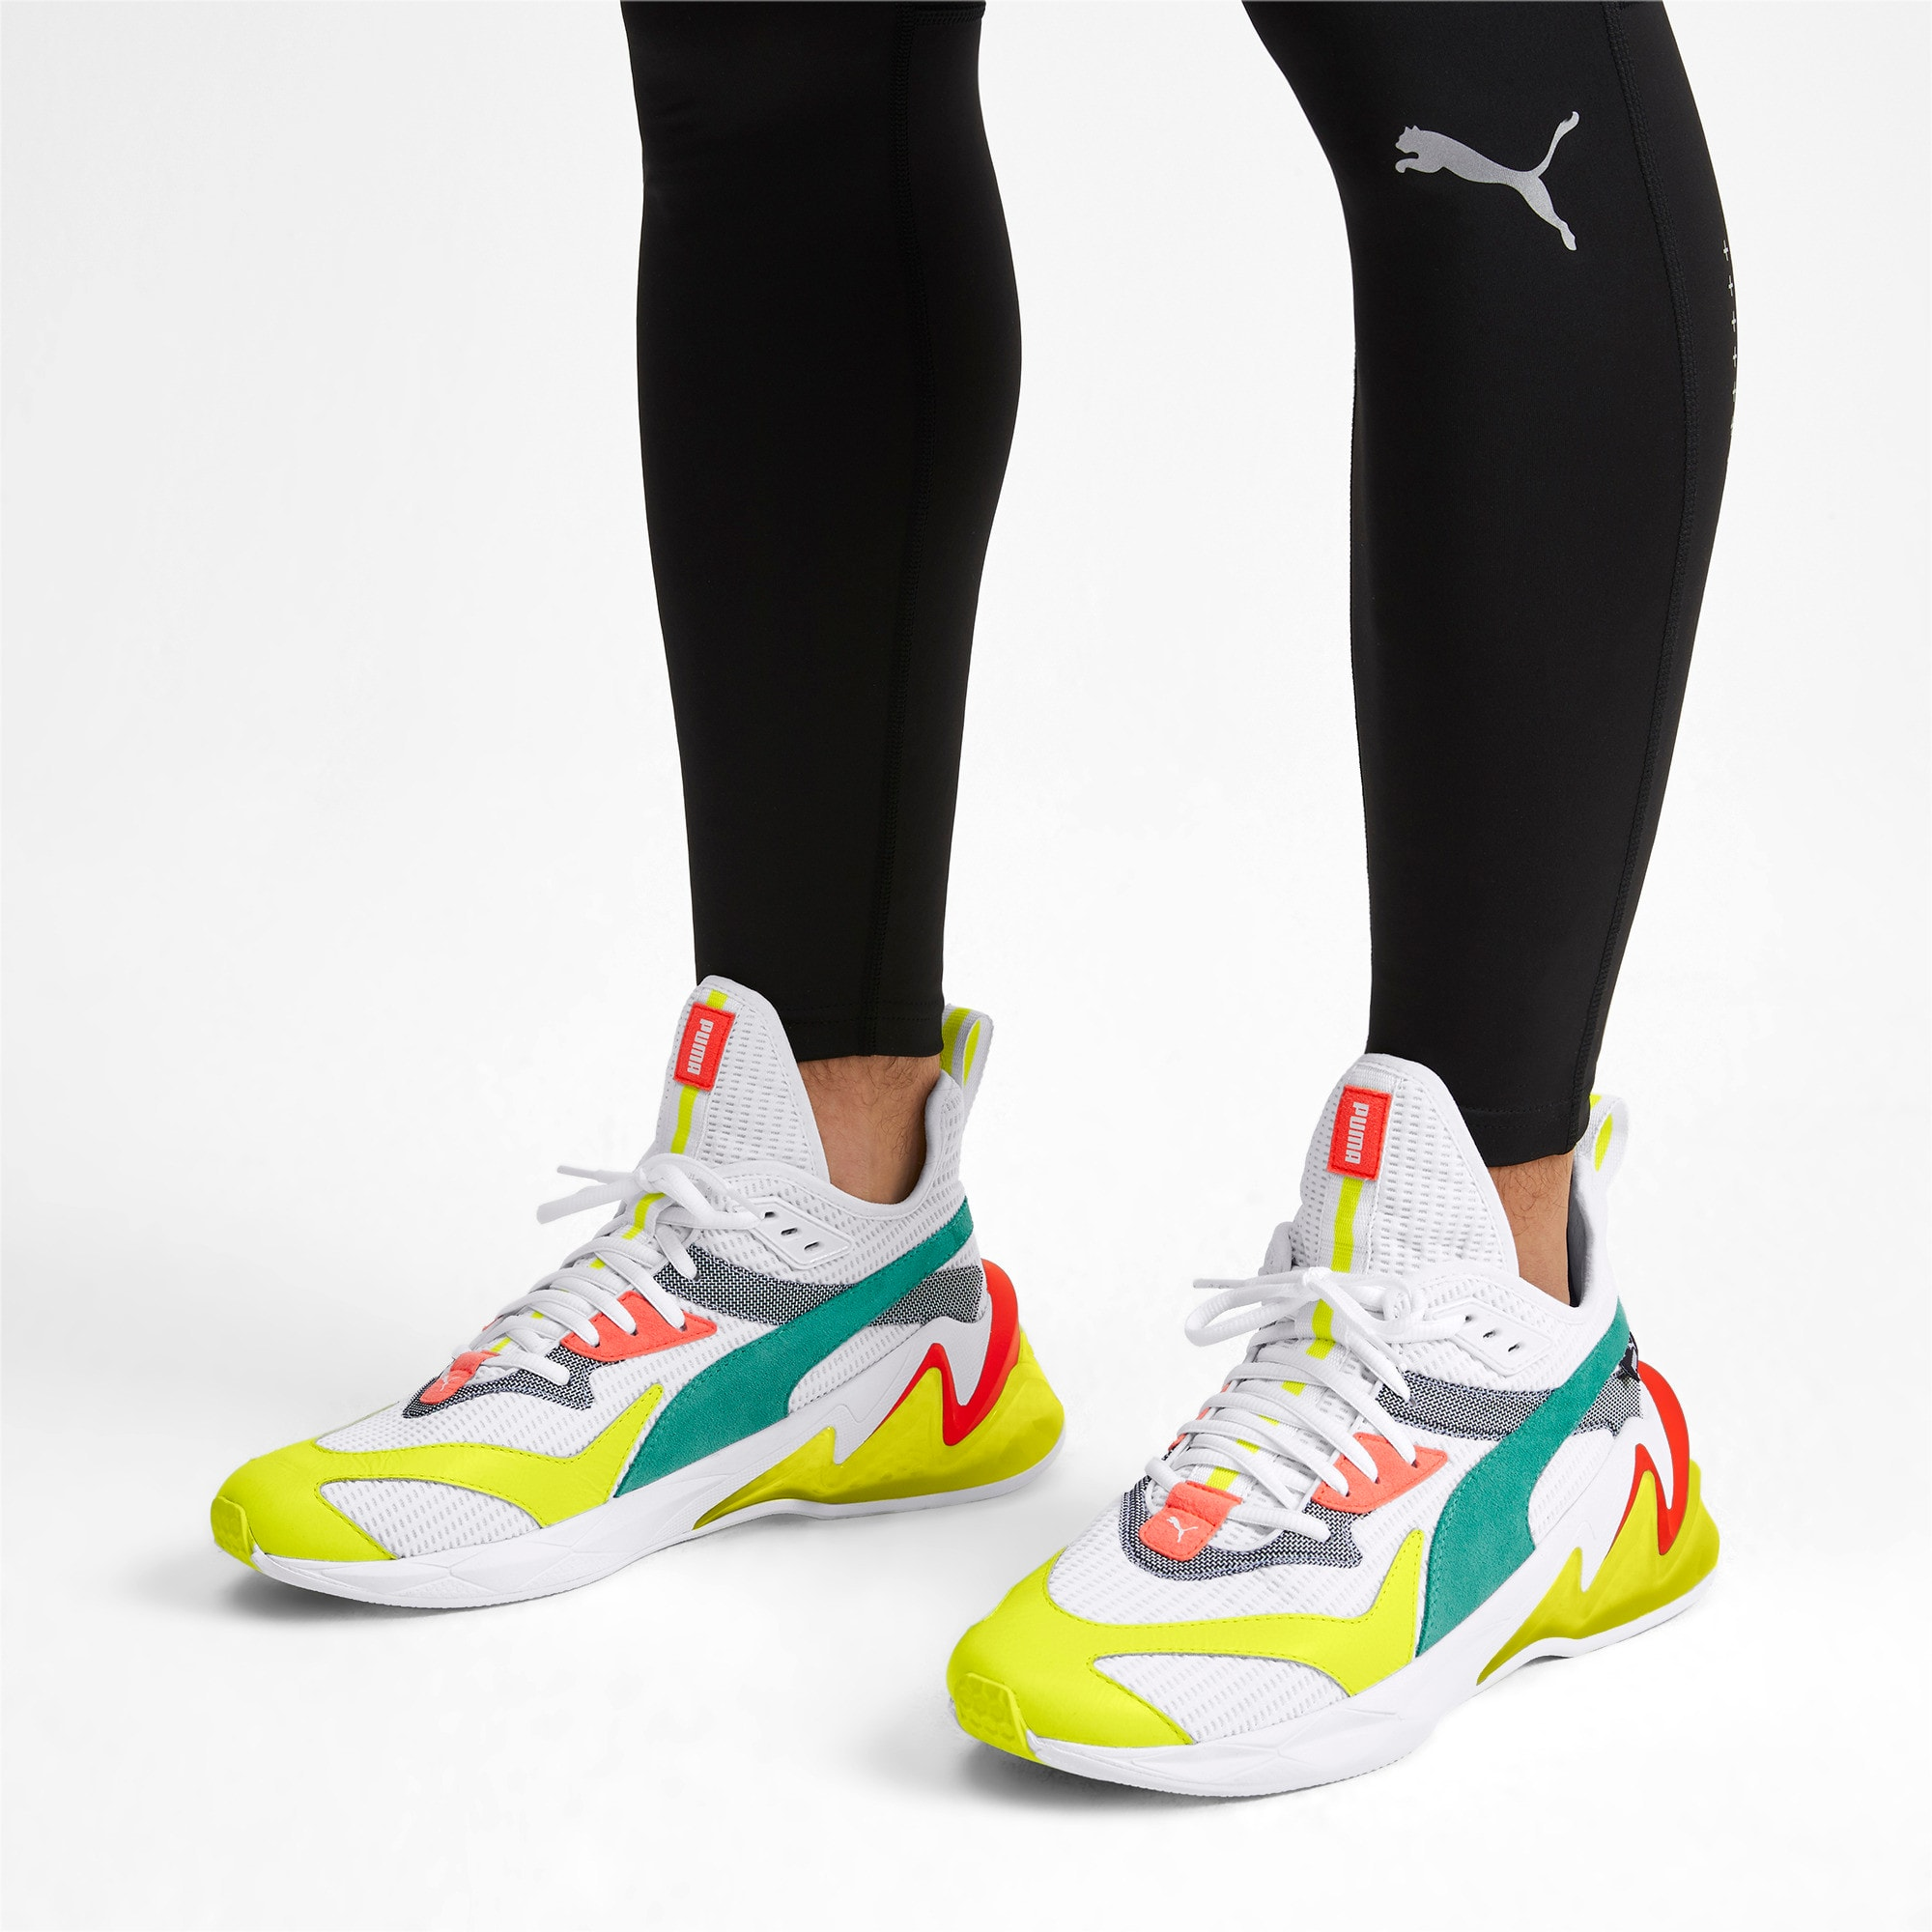 Miniatura 2 de Zapatos de entrenamientoLQDCELL Origin para hombre, Puma White-Yellow Alert, mediano